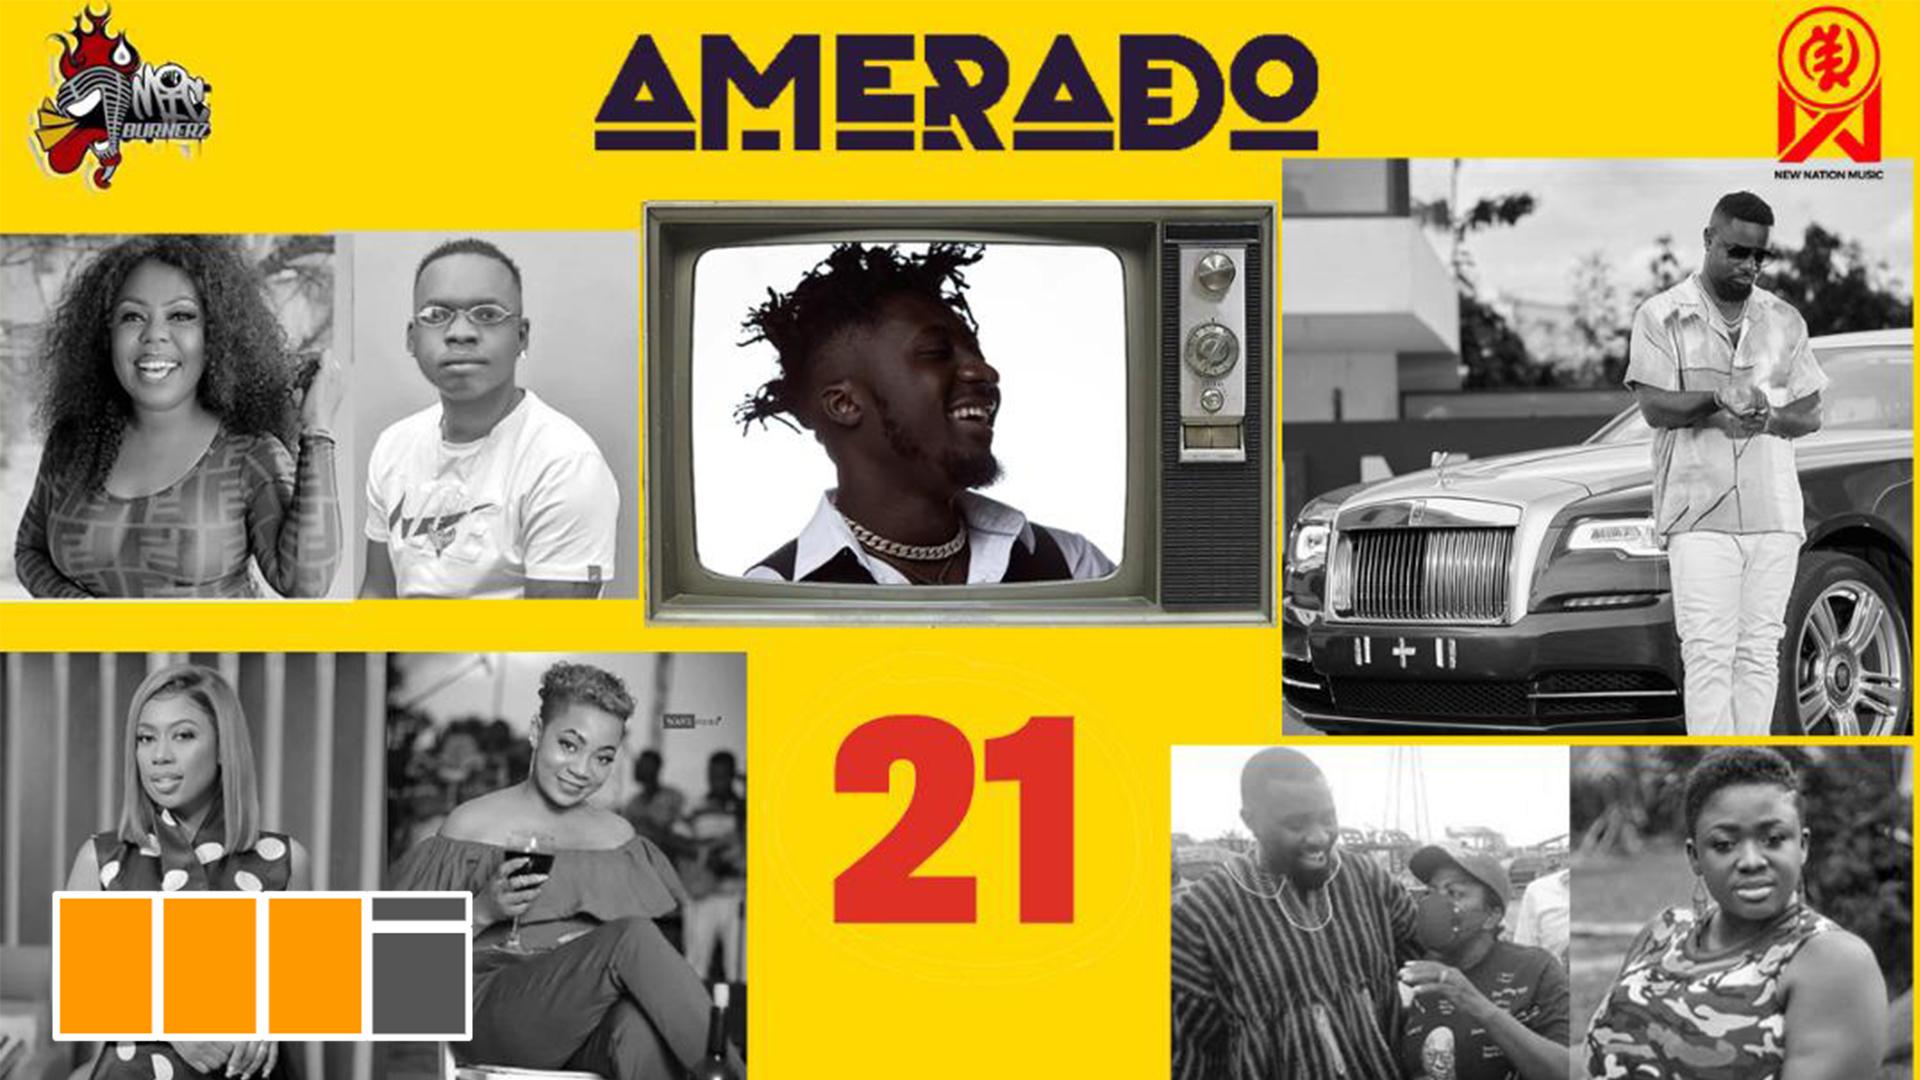 Amerado recruits AMG's Evergreen on Yeete Nsem Episode 21